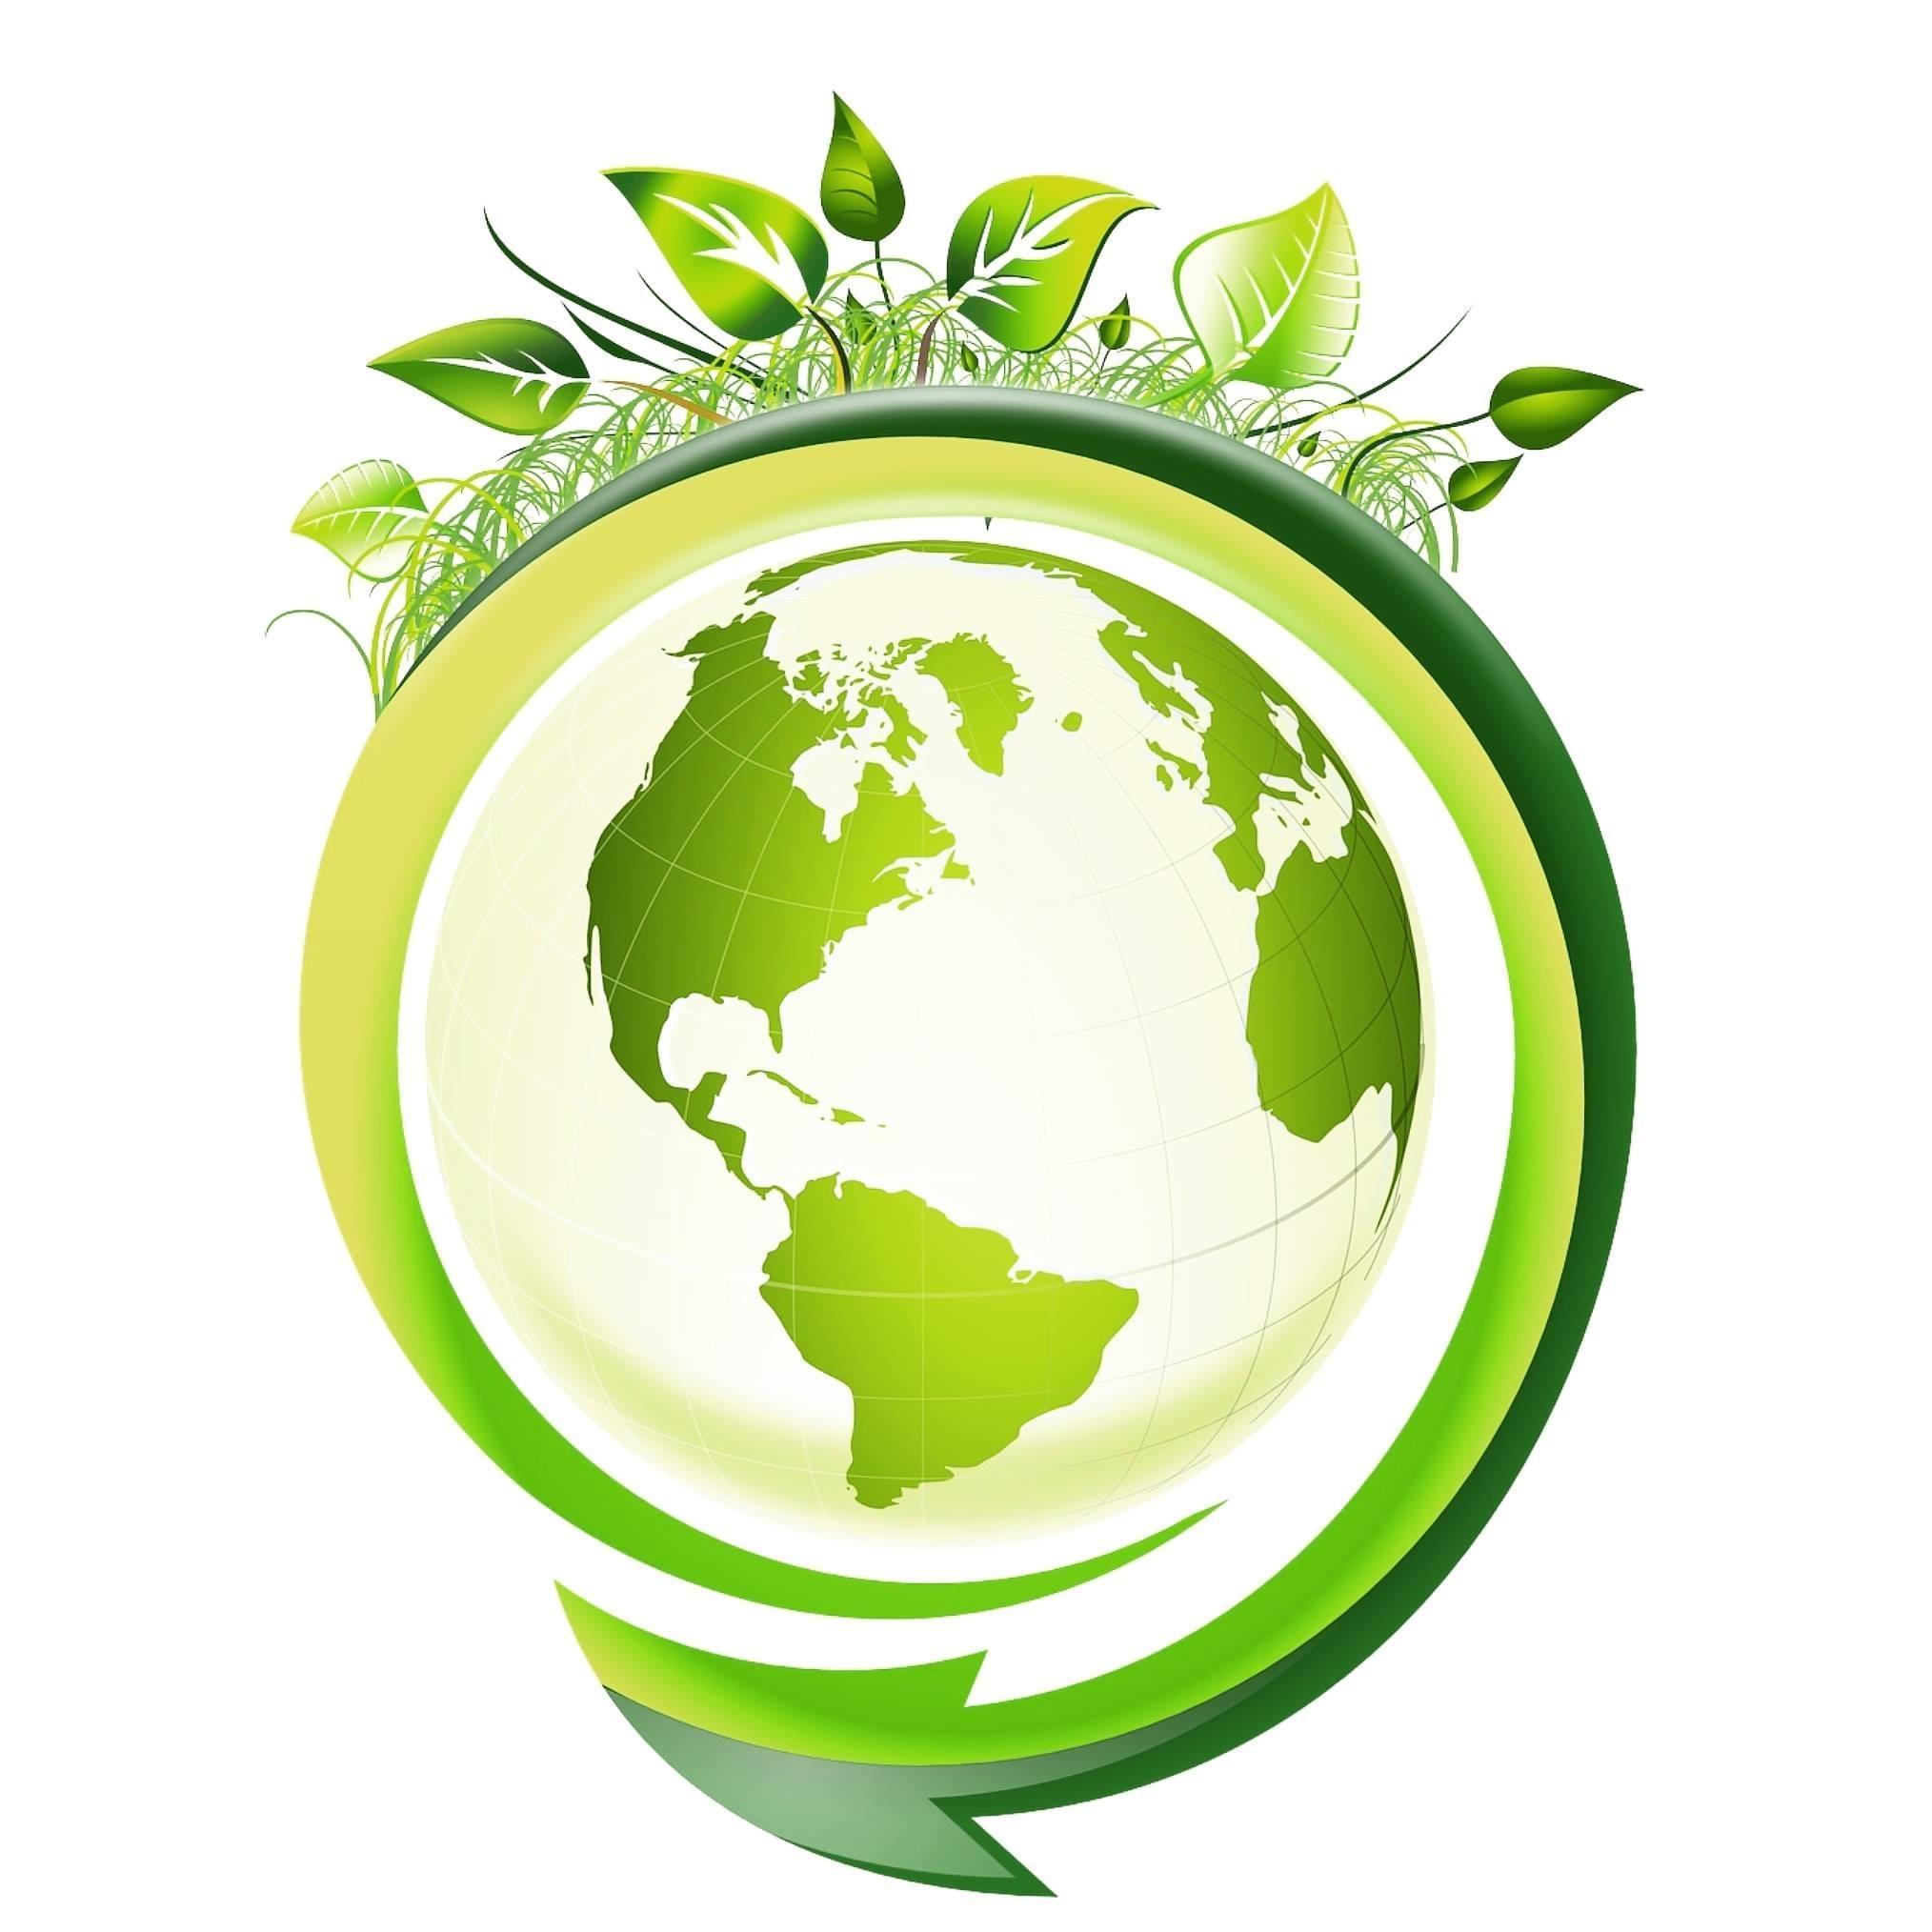 Logo Soins au naturel